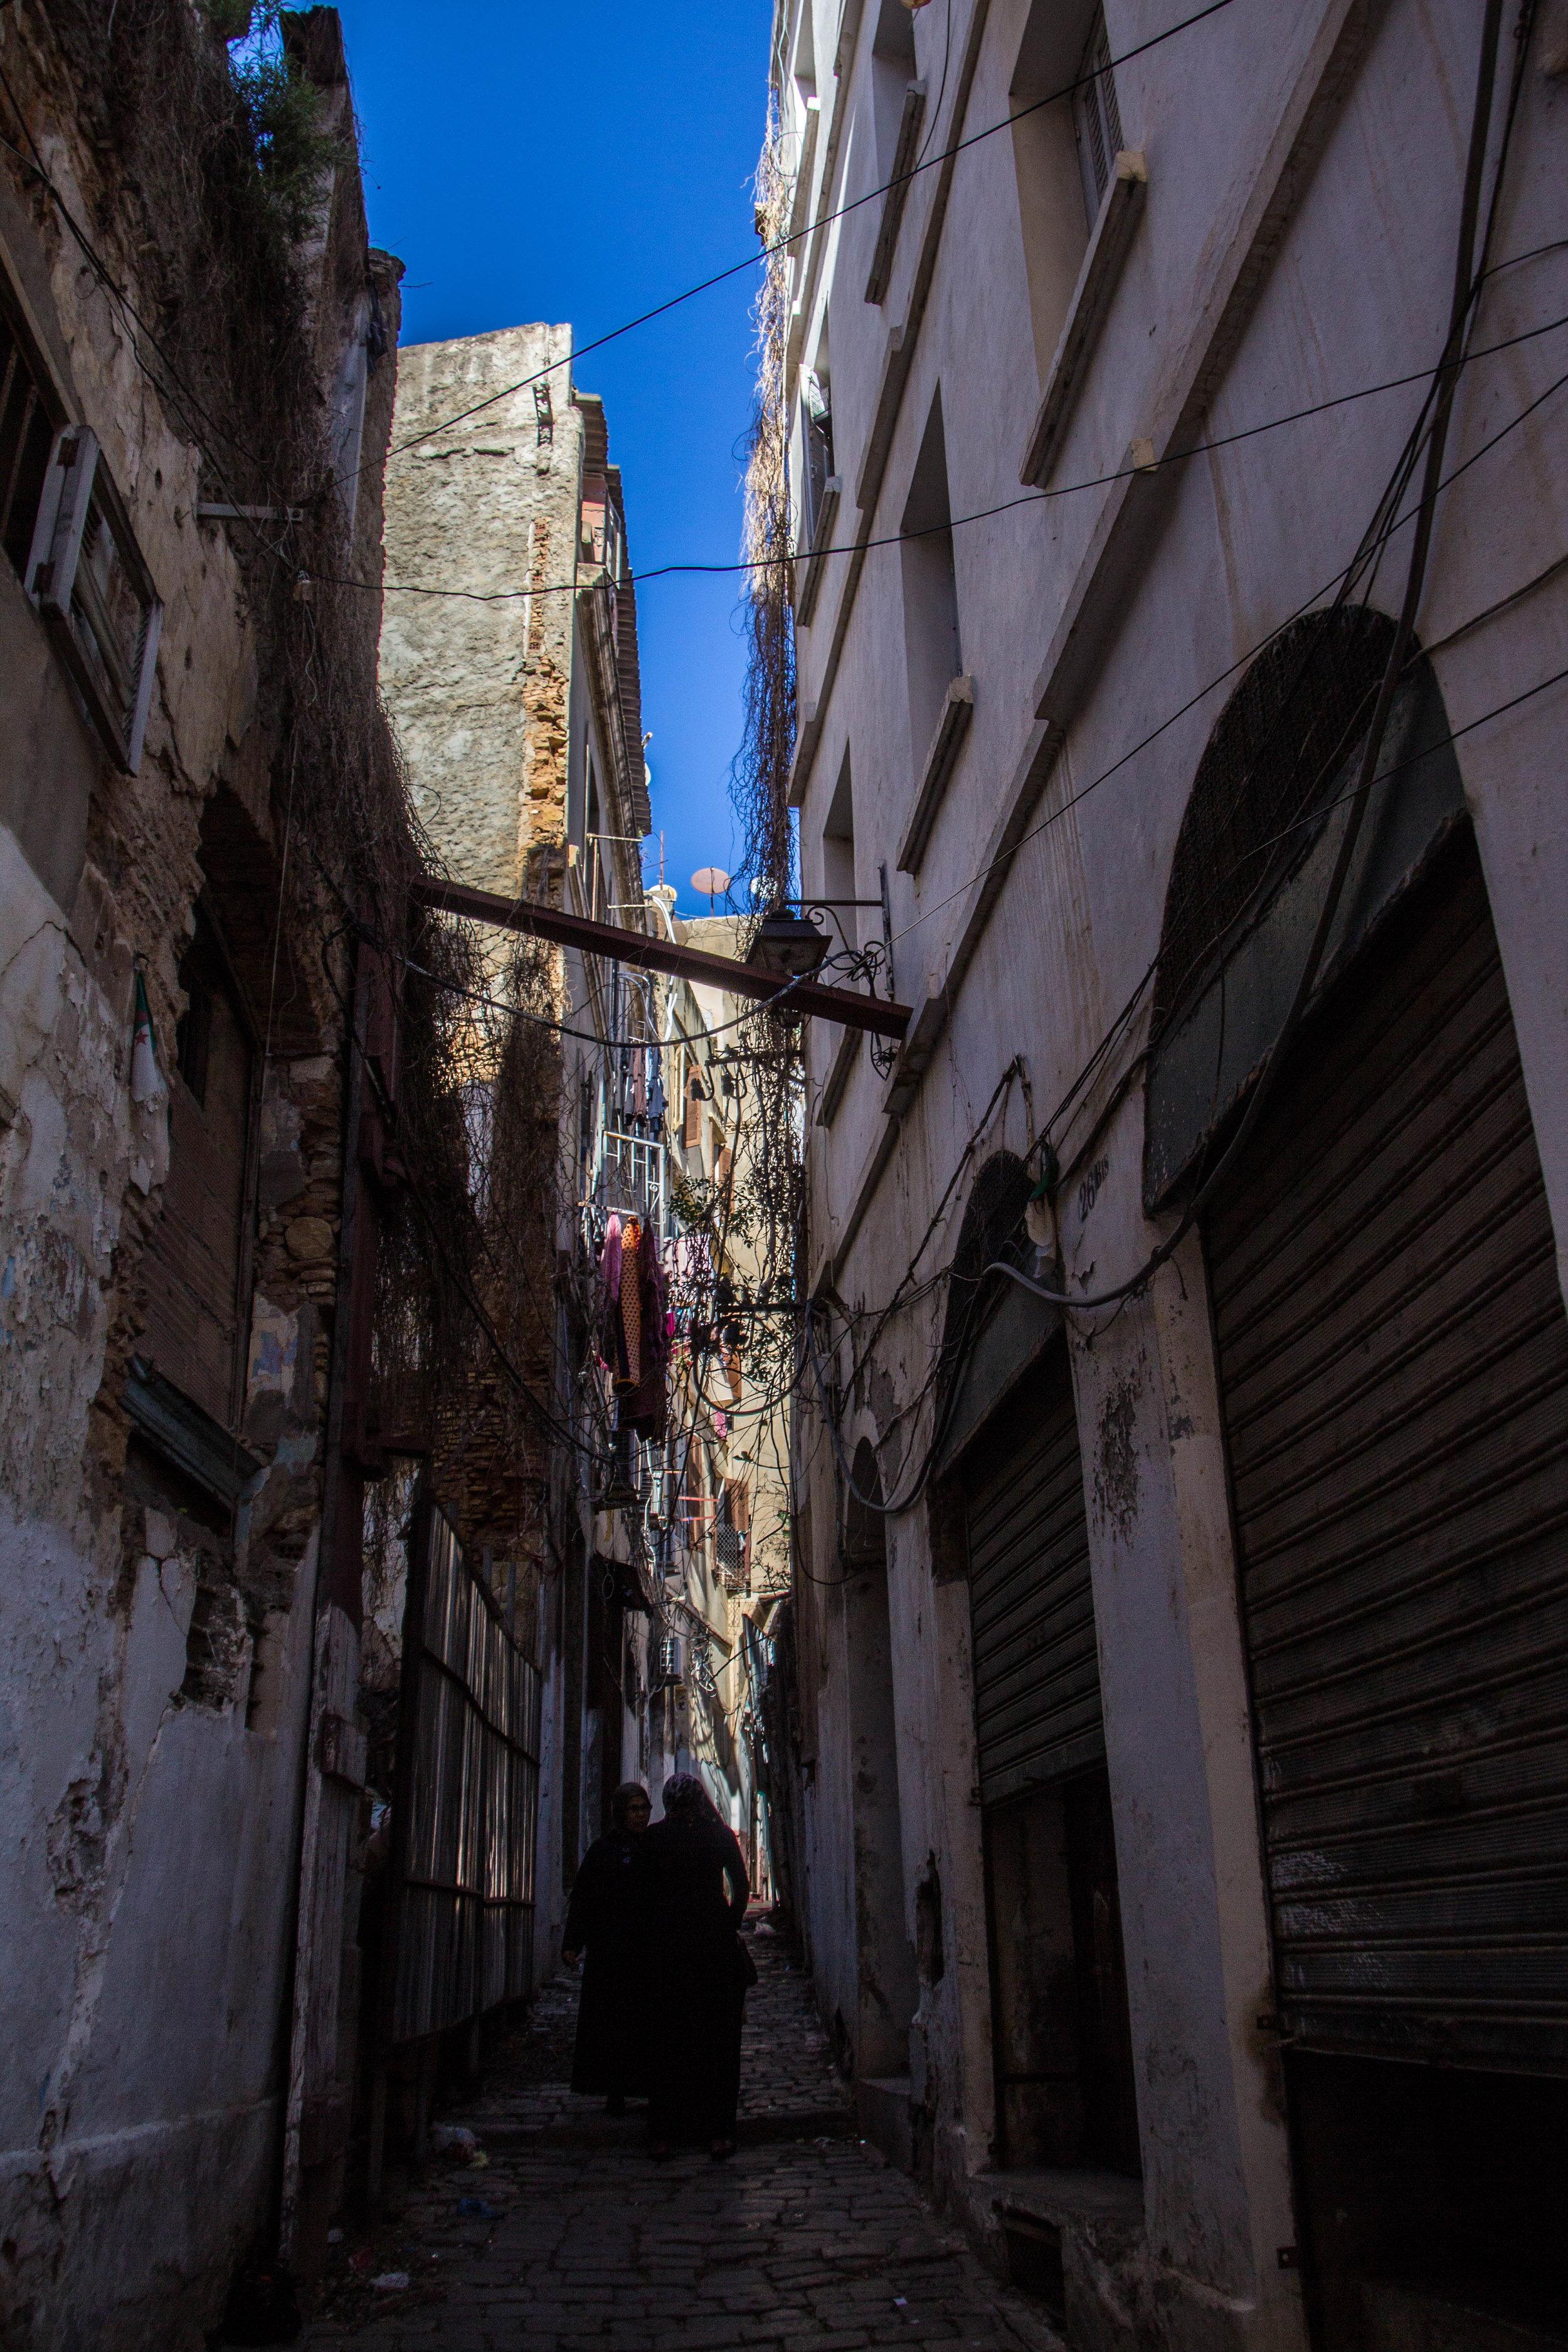 casbah-photography-algiers-algeria-alger-73.jpg